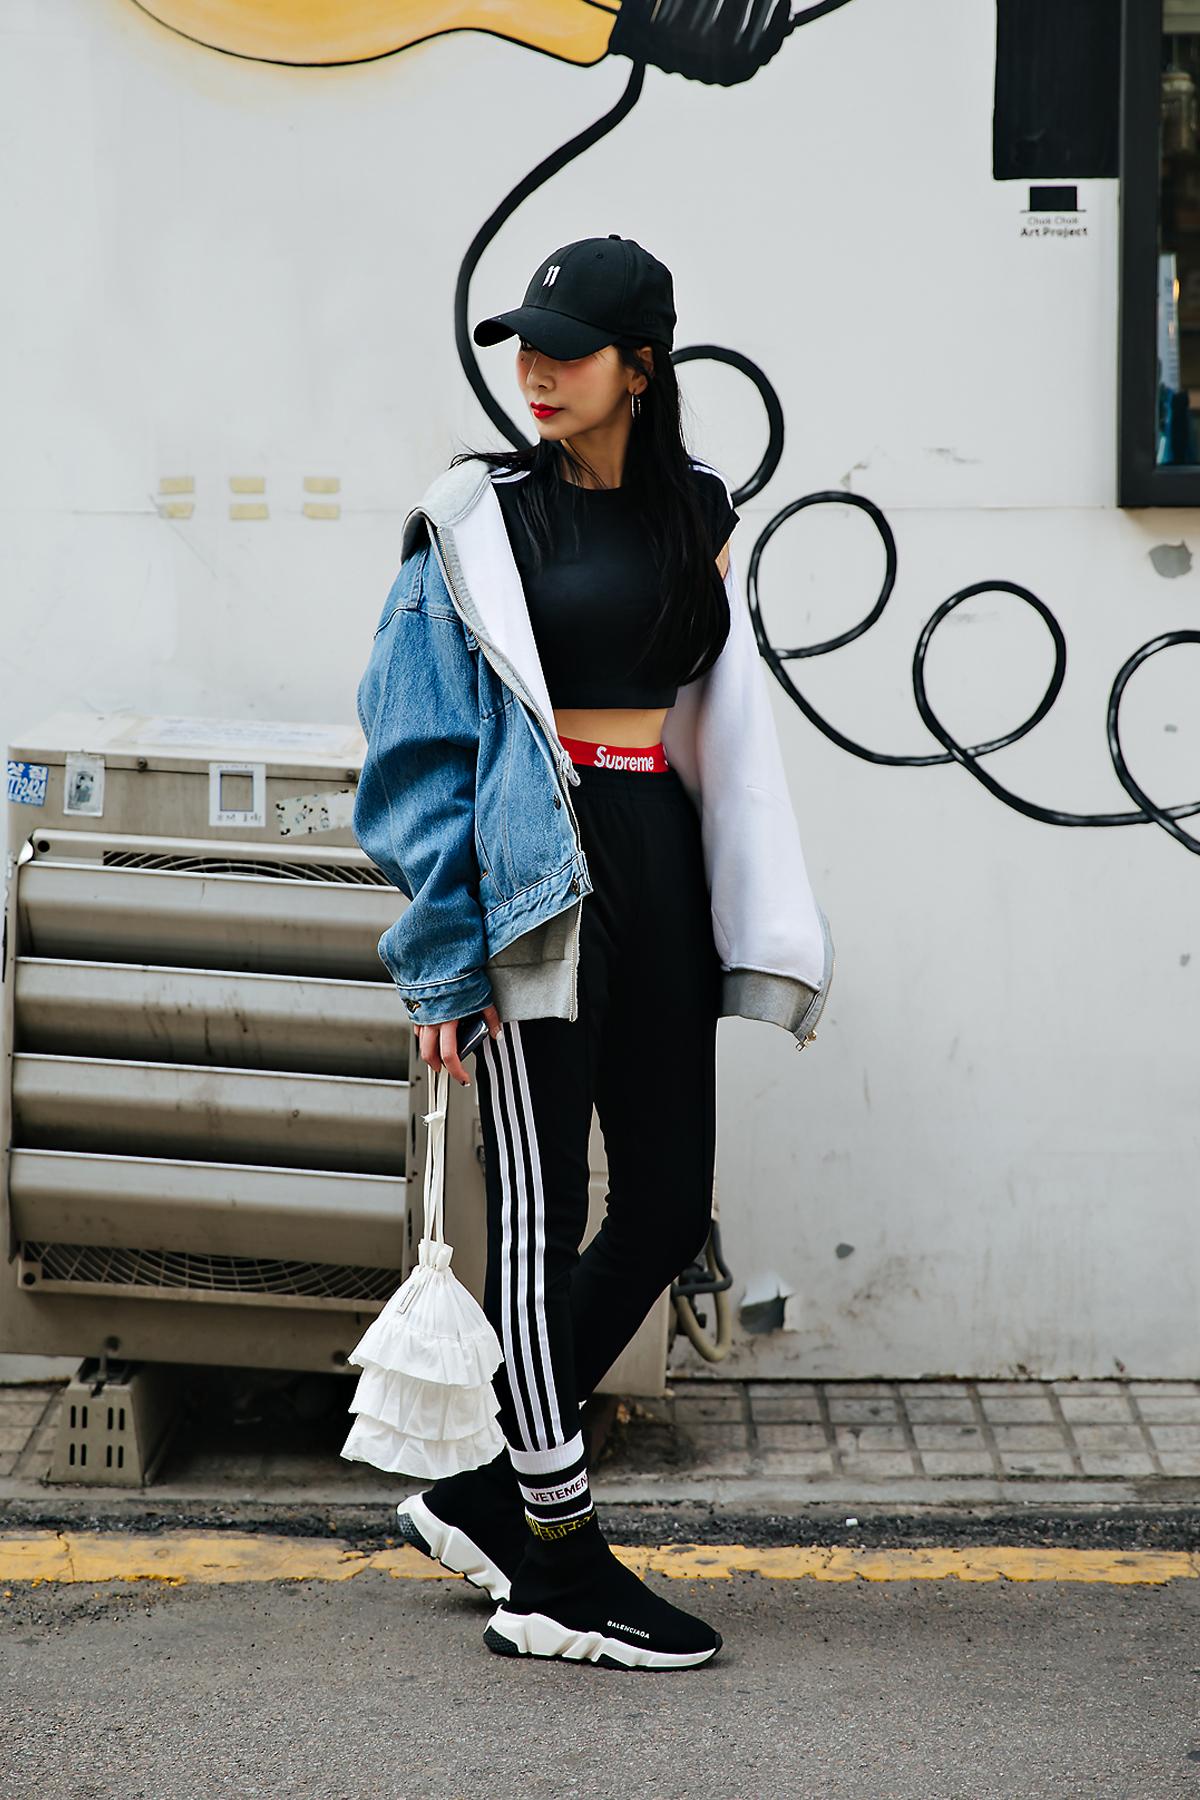 Lee Chaerim, Street style women spring 2018 in seoul